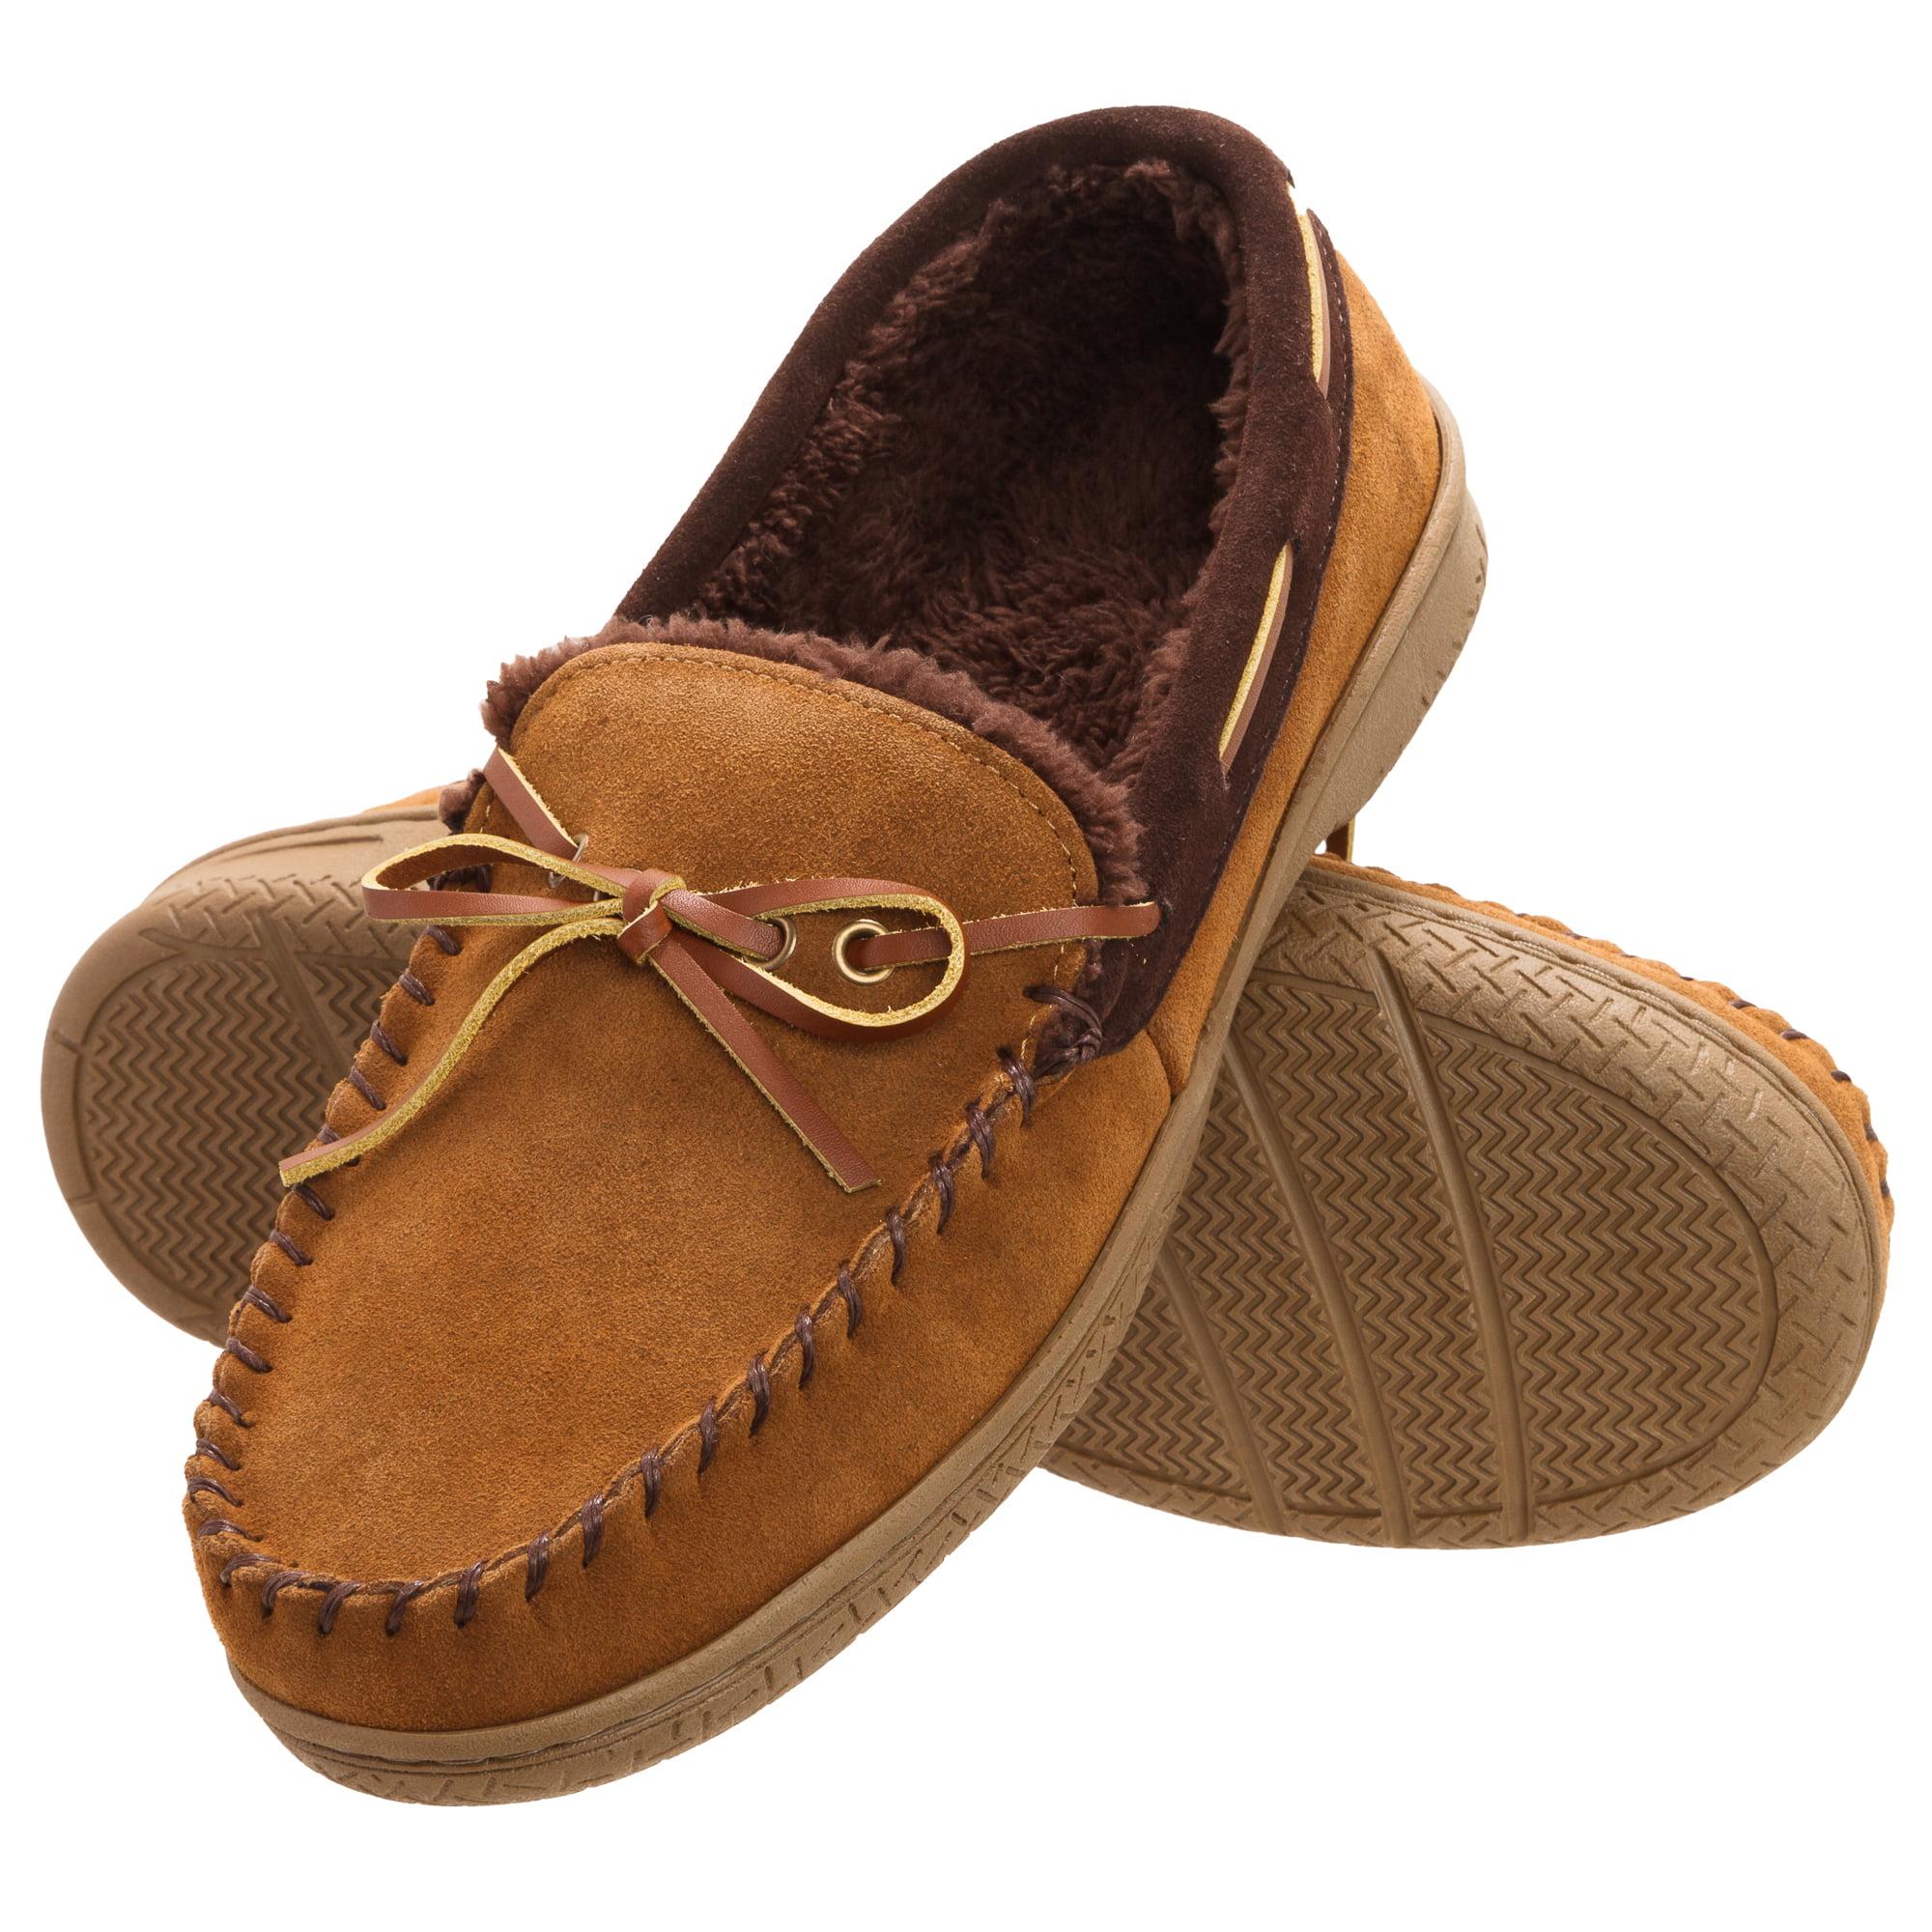 Outdoor Brown Coffee Pick Size New Dearfoams Men/'s Memory Foam Slippers Indoor